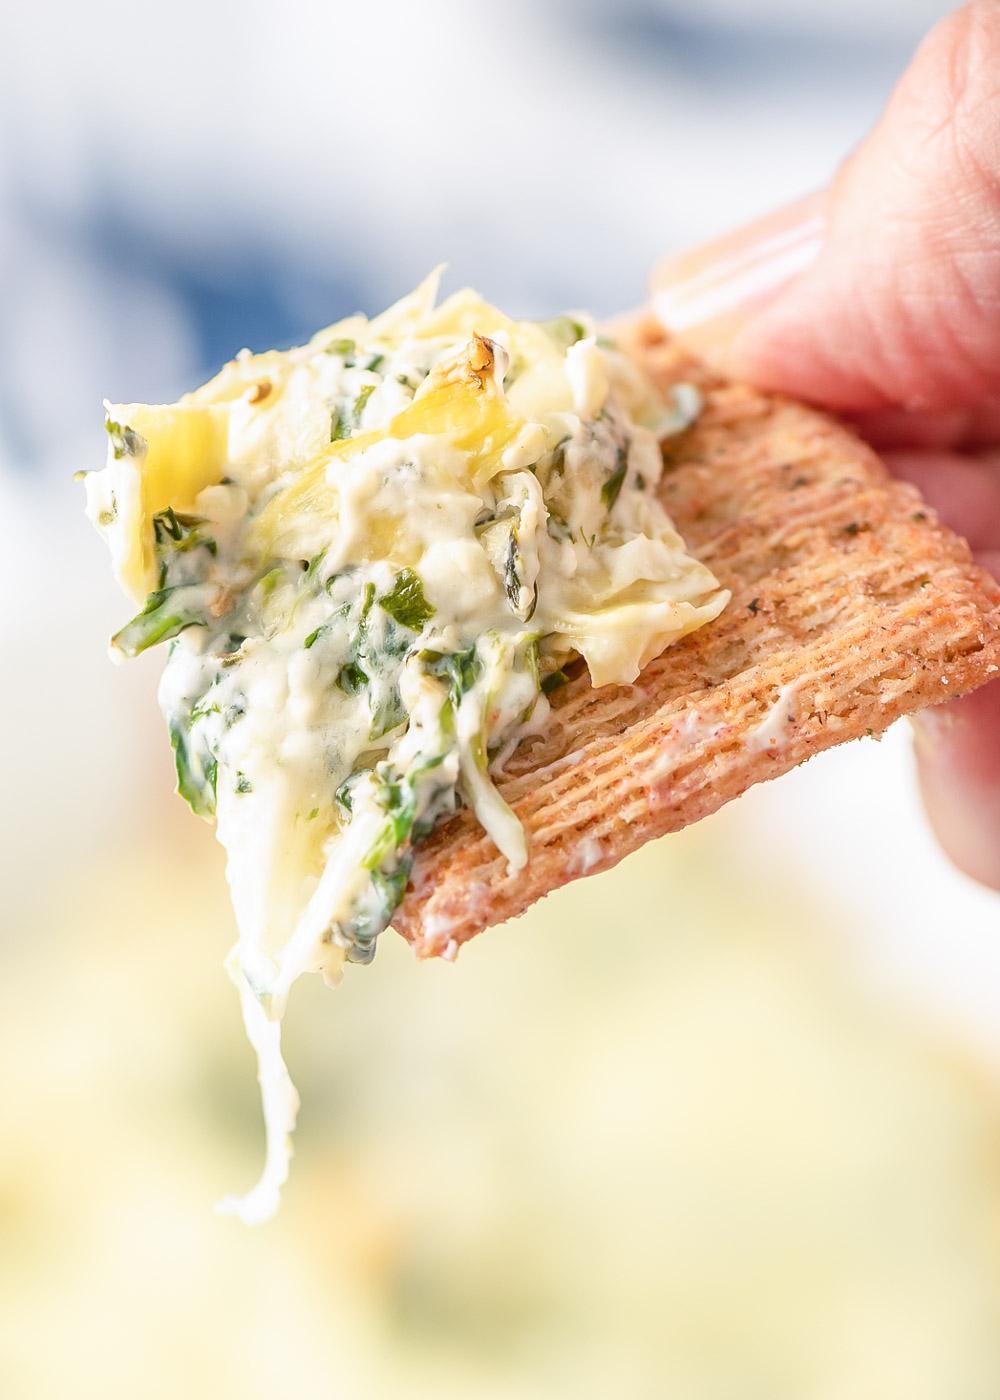 Hot artichoke dip on a cracker